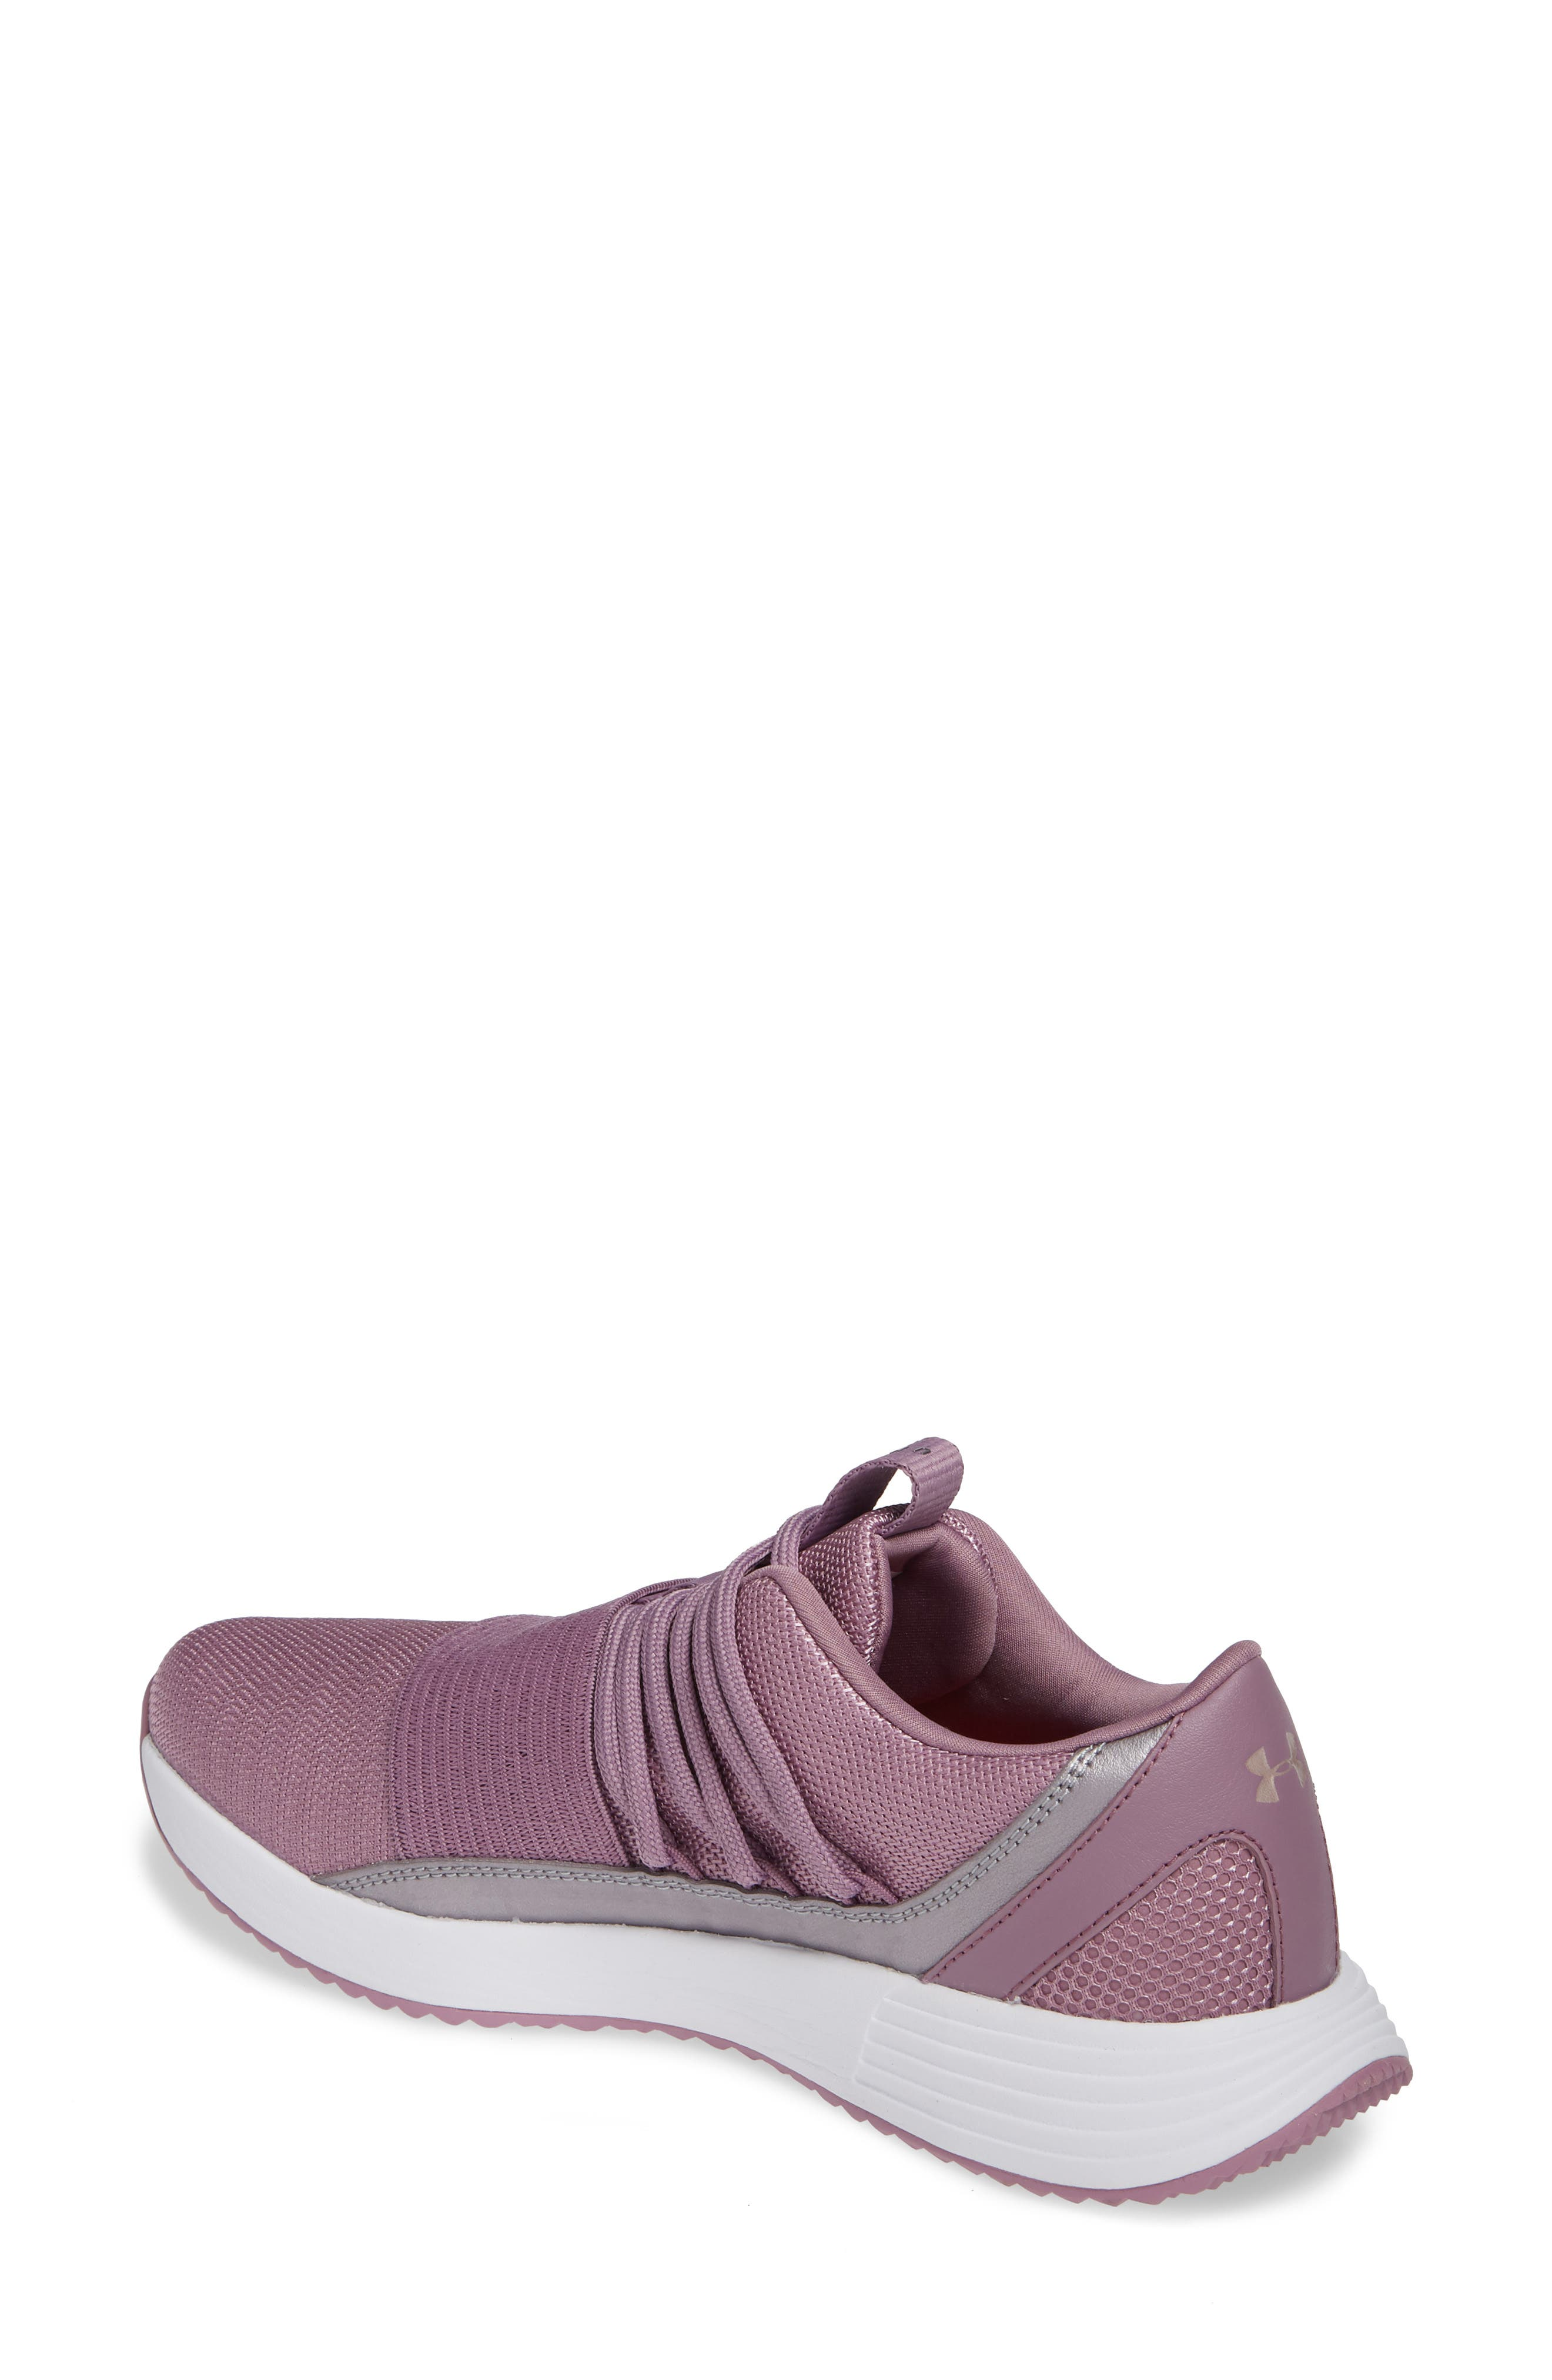 Breathe Lace X NM Sneaker,                             Alternate thumbnail 2, color,                             PURPLE PRIME/ WHITE/ WHITE